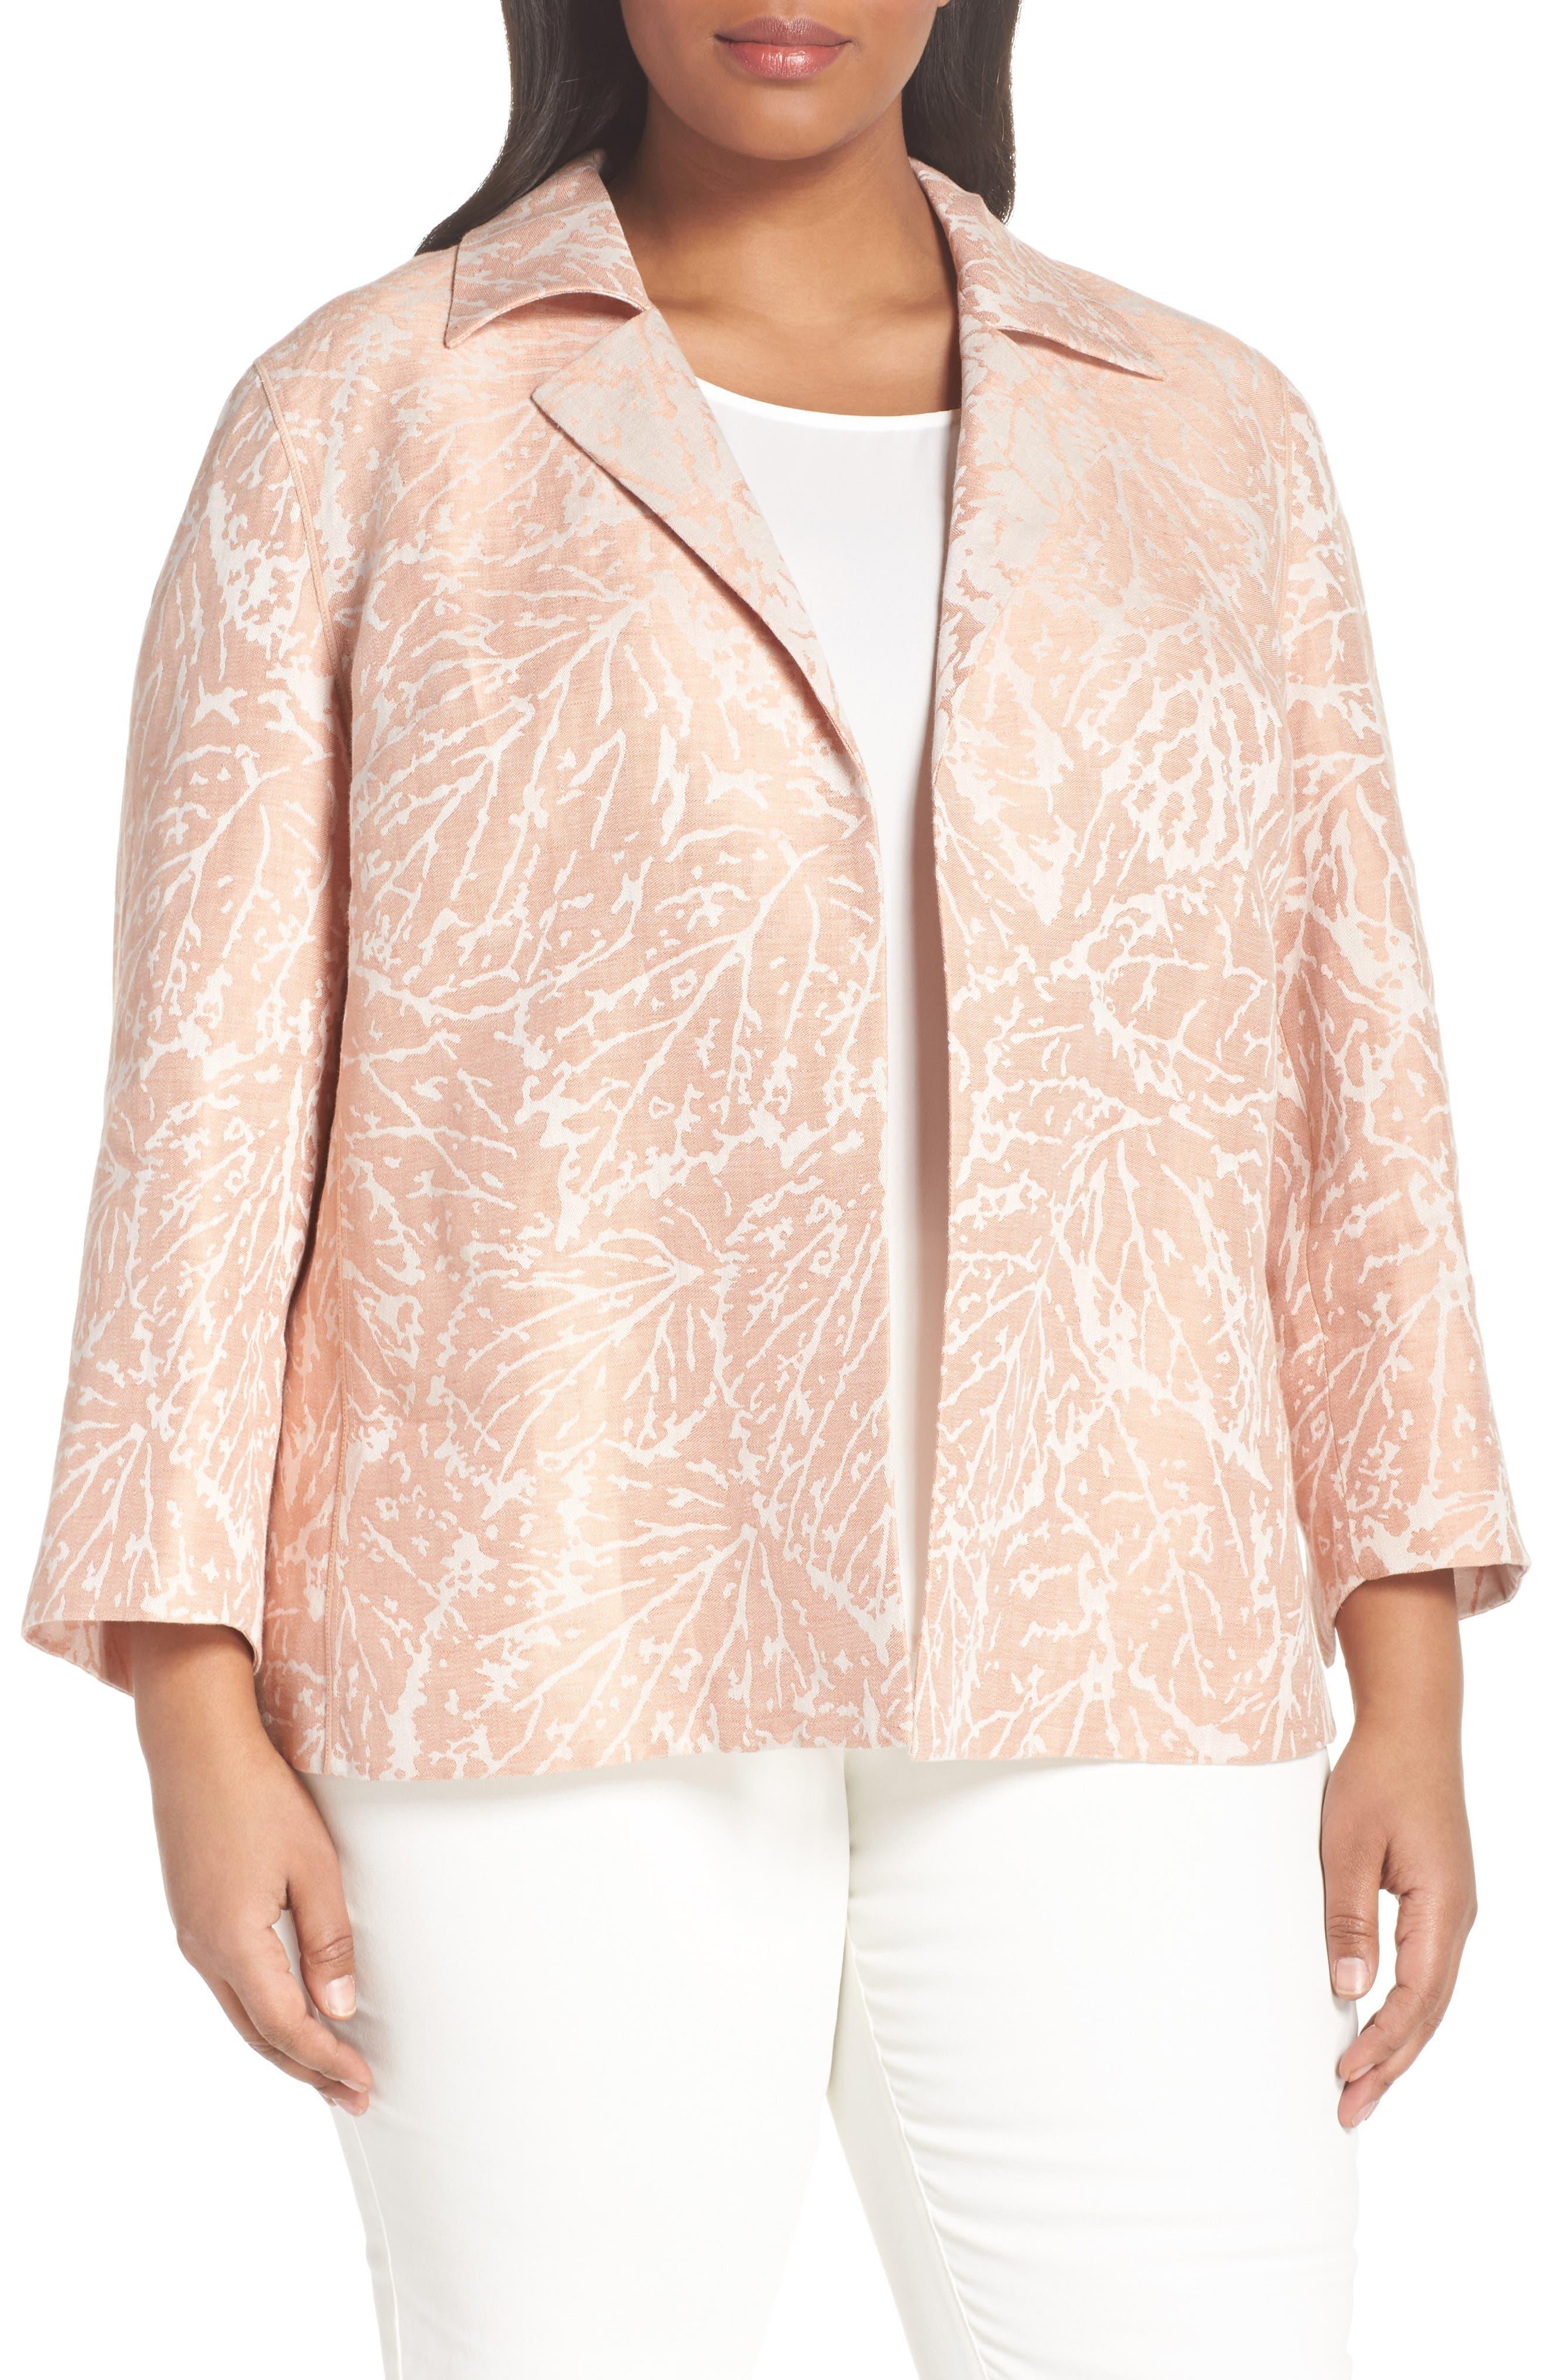 Lafayette 148 New York Phillipe Linen Jacket (Plus Size)